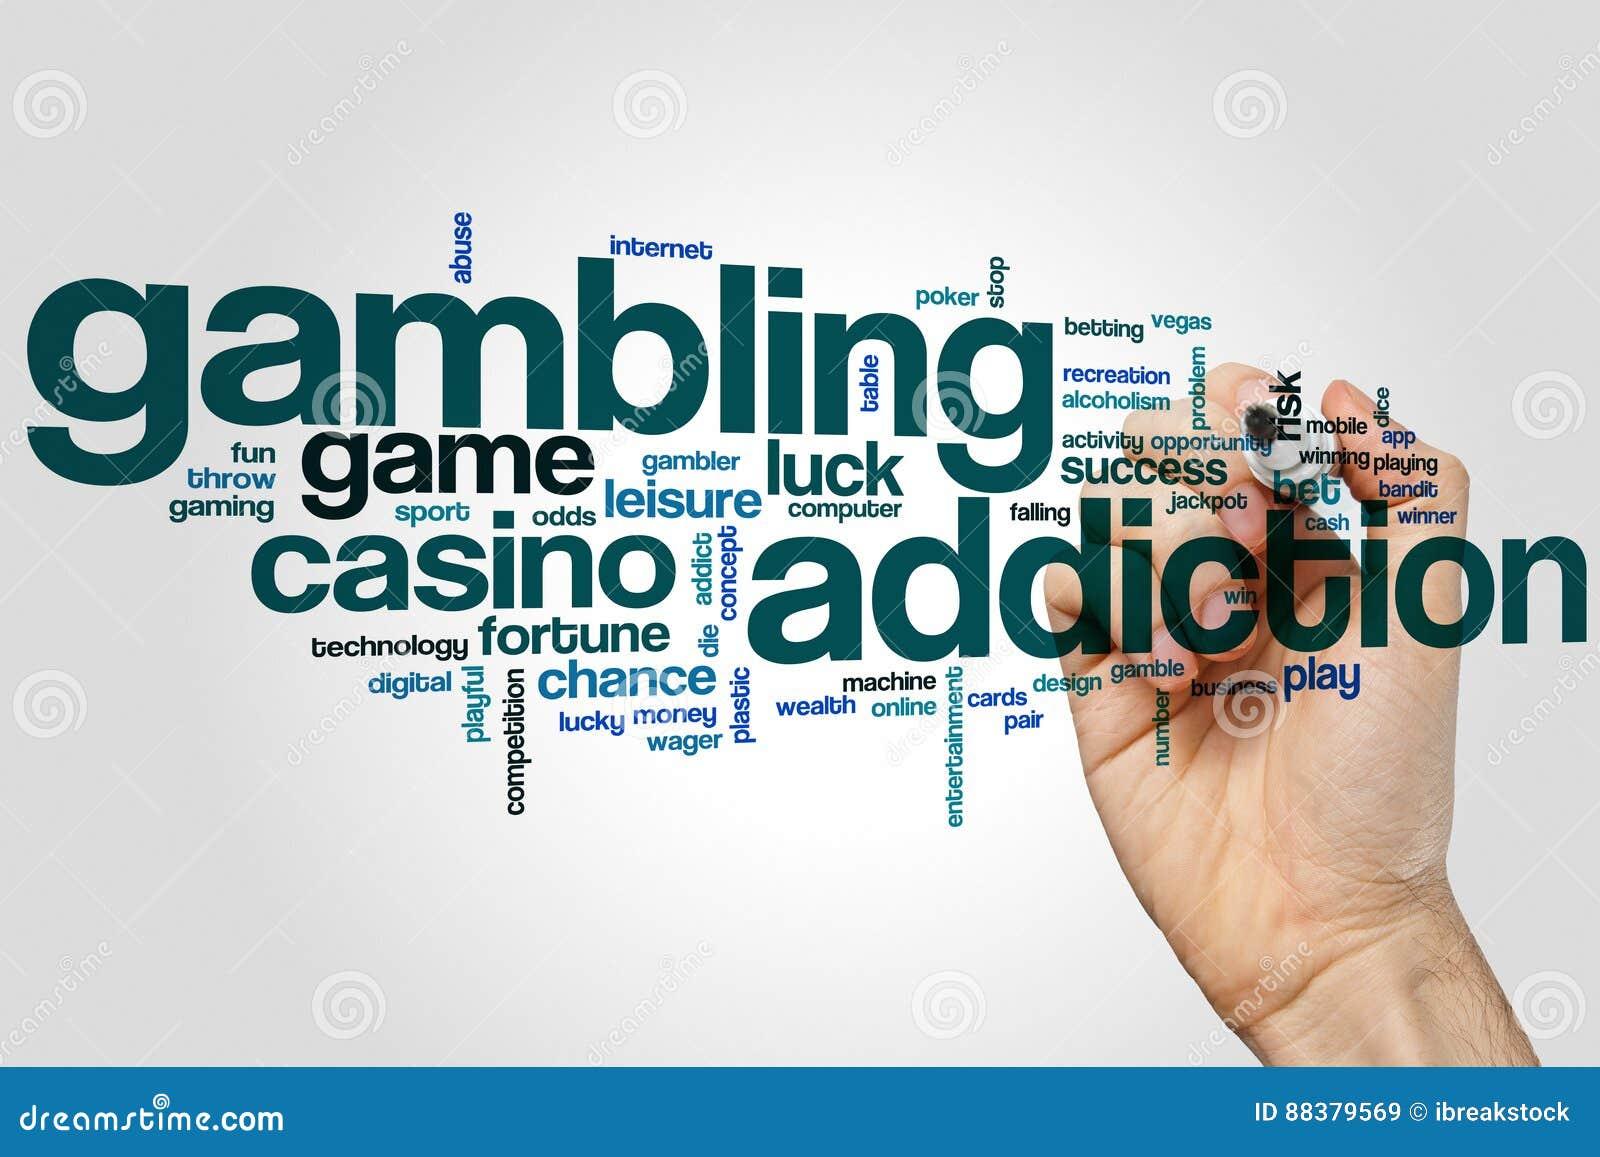 Gambling Addiction Word Cloud Stock Image - Image of luck